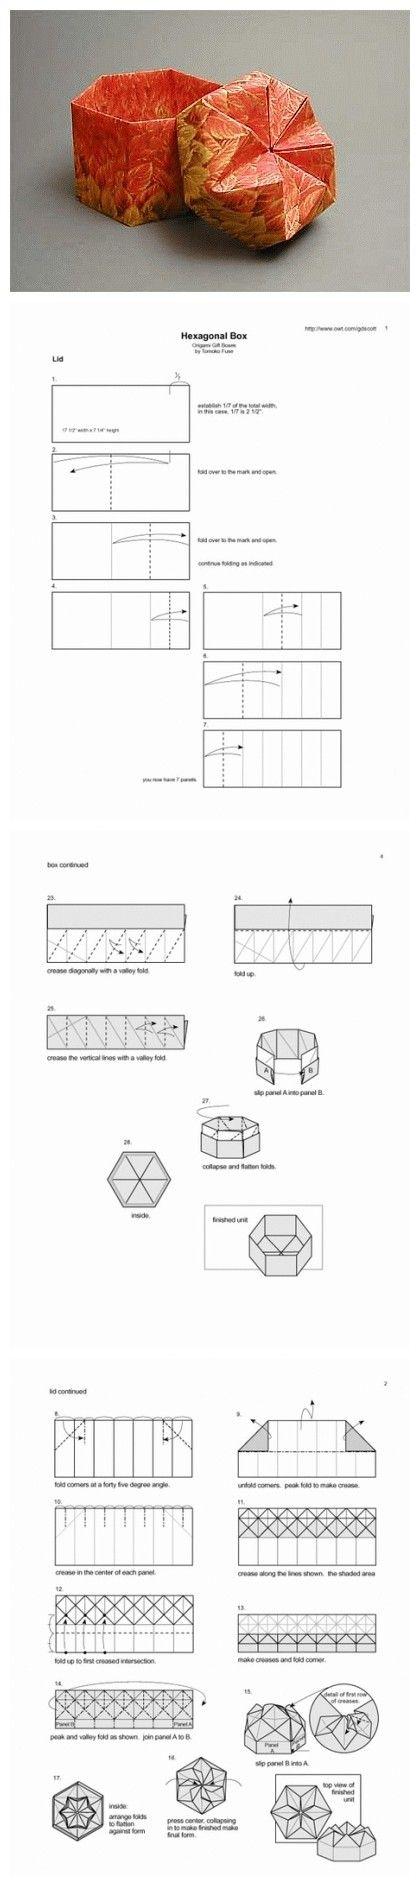 Paper Folding – Life Through A Mathematician's Eyes   1886x420